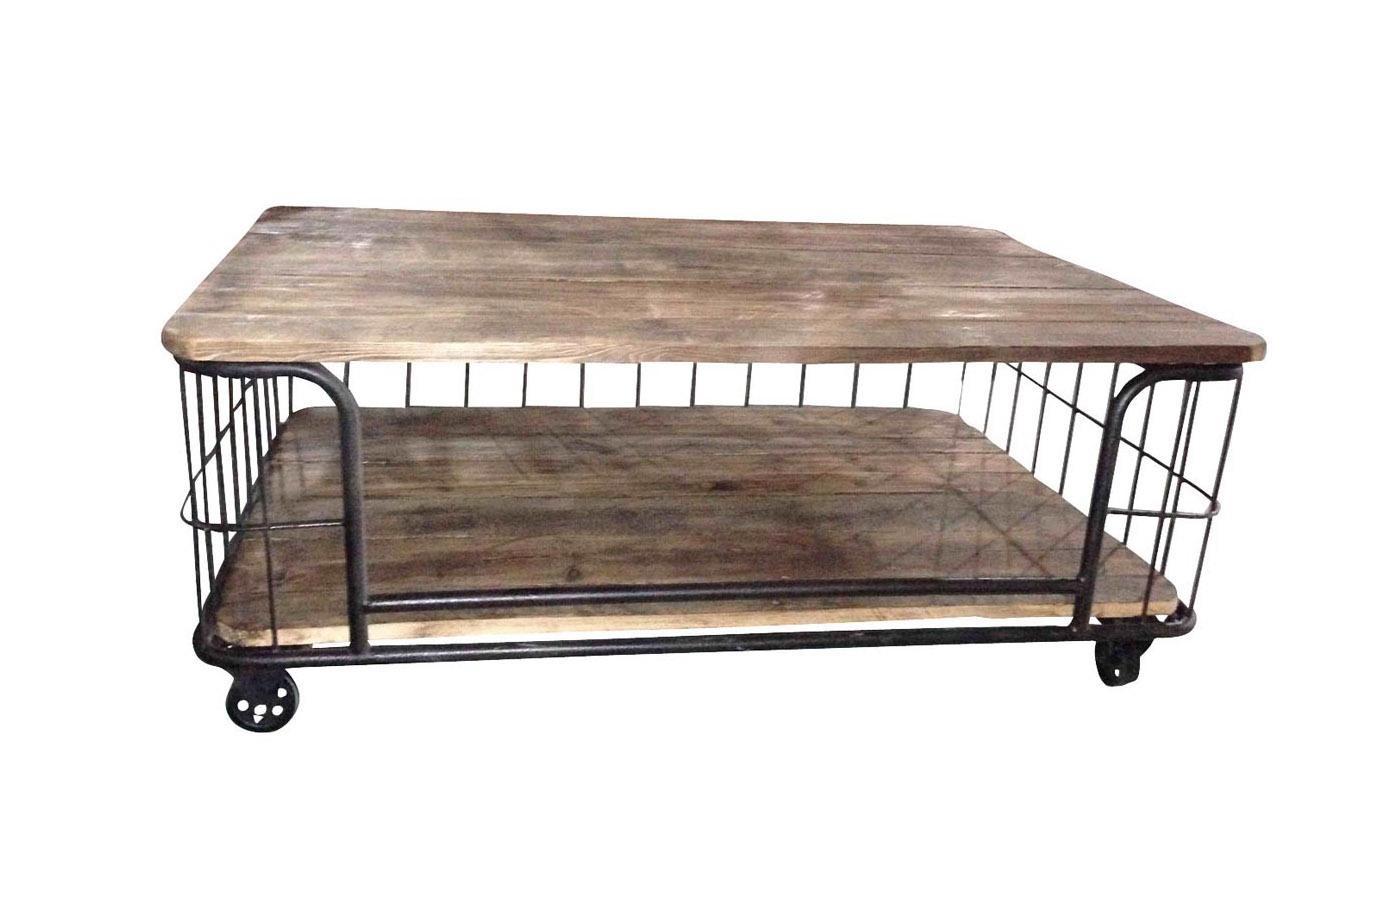 Table originale en bois trendy table basse originale for Table originale